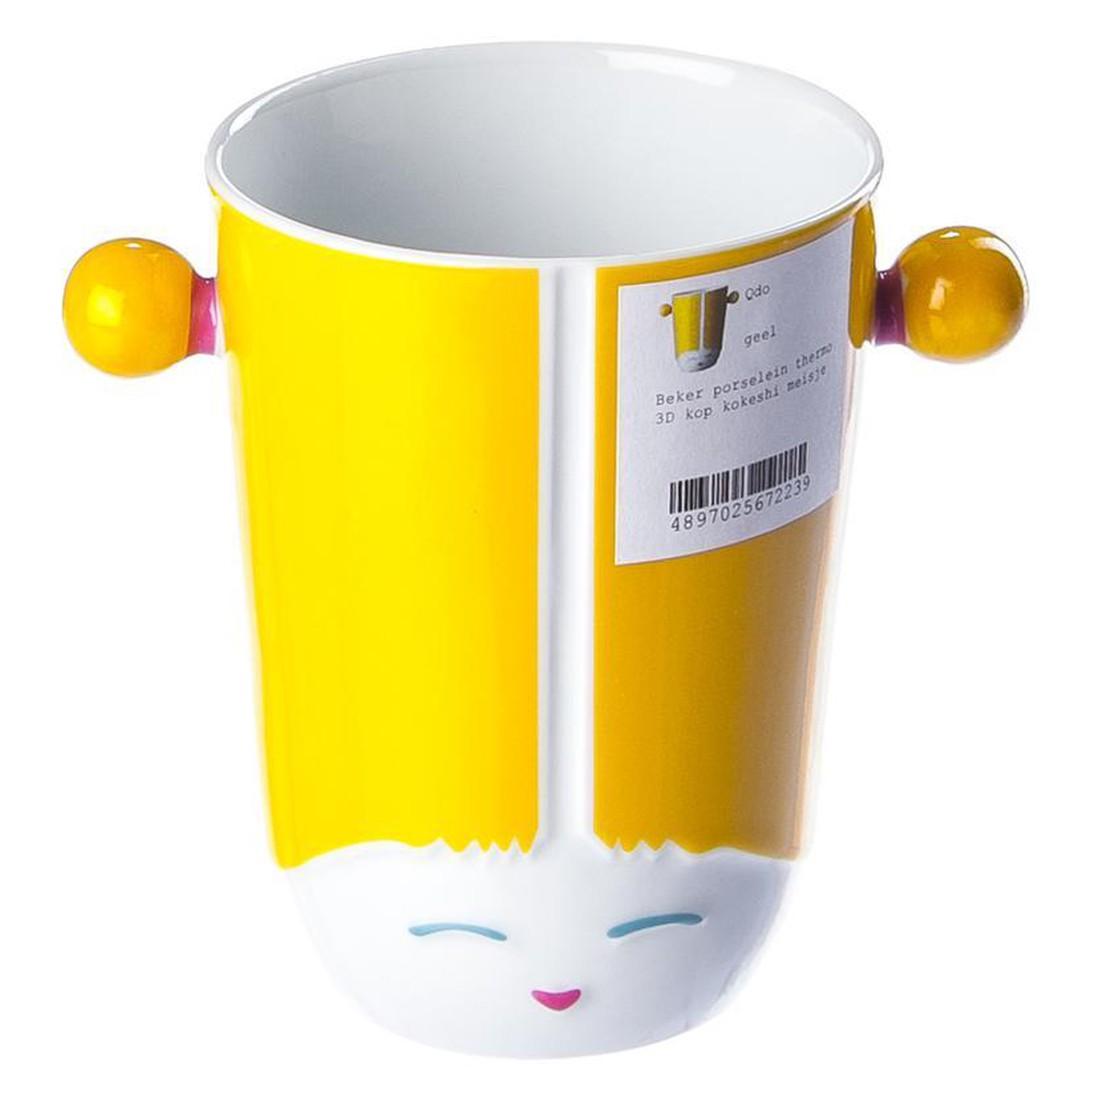 Thermobecher 3D-Tasse Kokeshi Girl – Porzellan – Gelb, Qdo kaufen